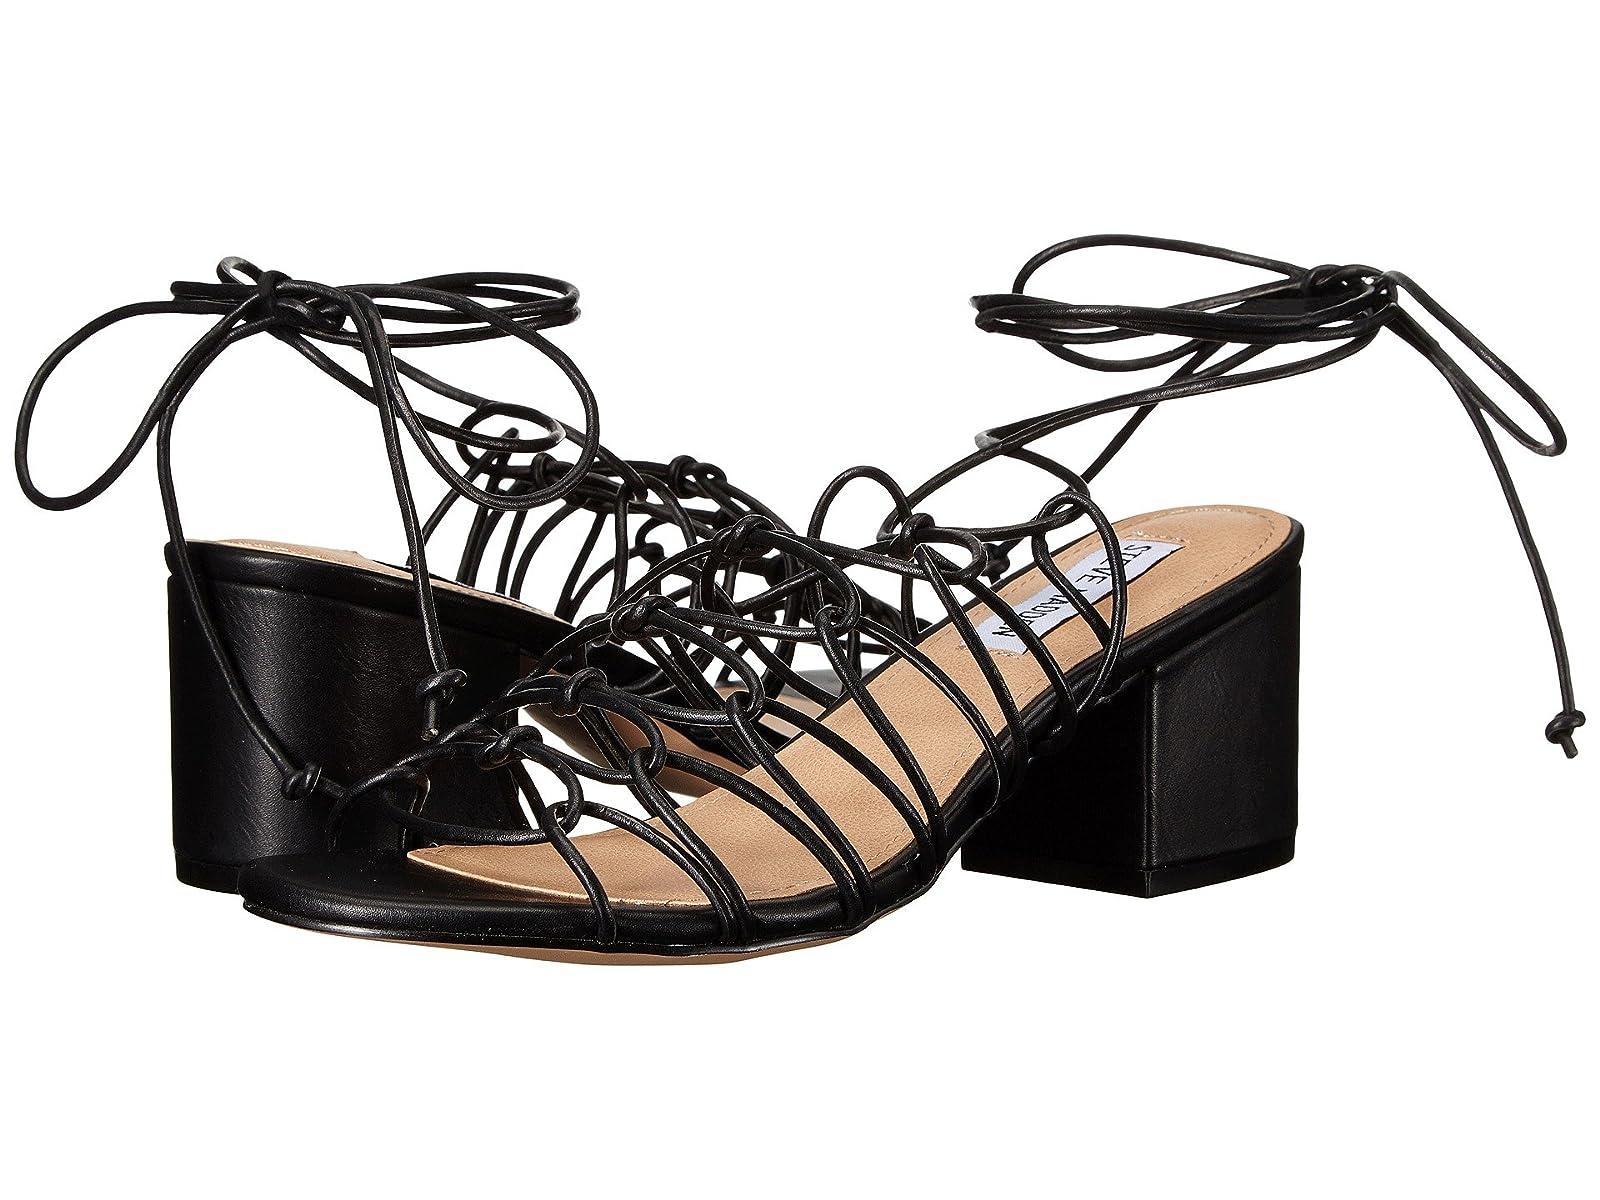 Steve Madden IllieCheap and distinctive eye-catching shoes